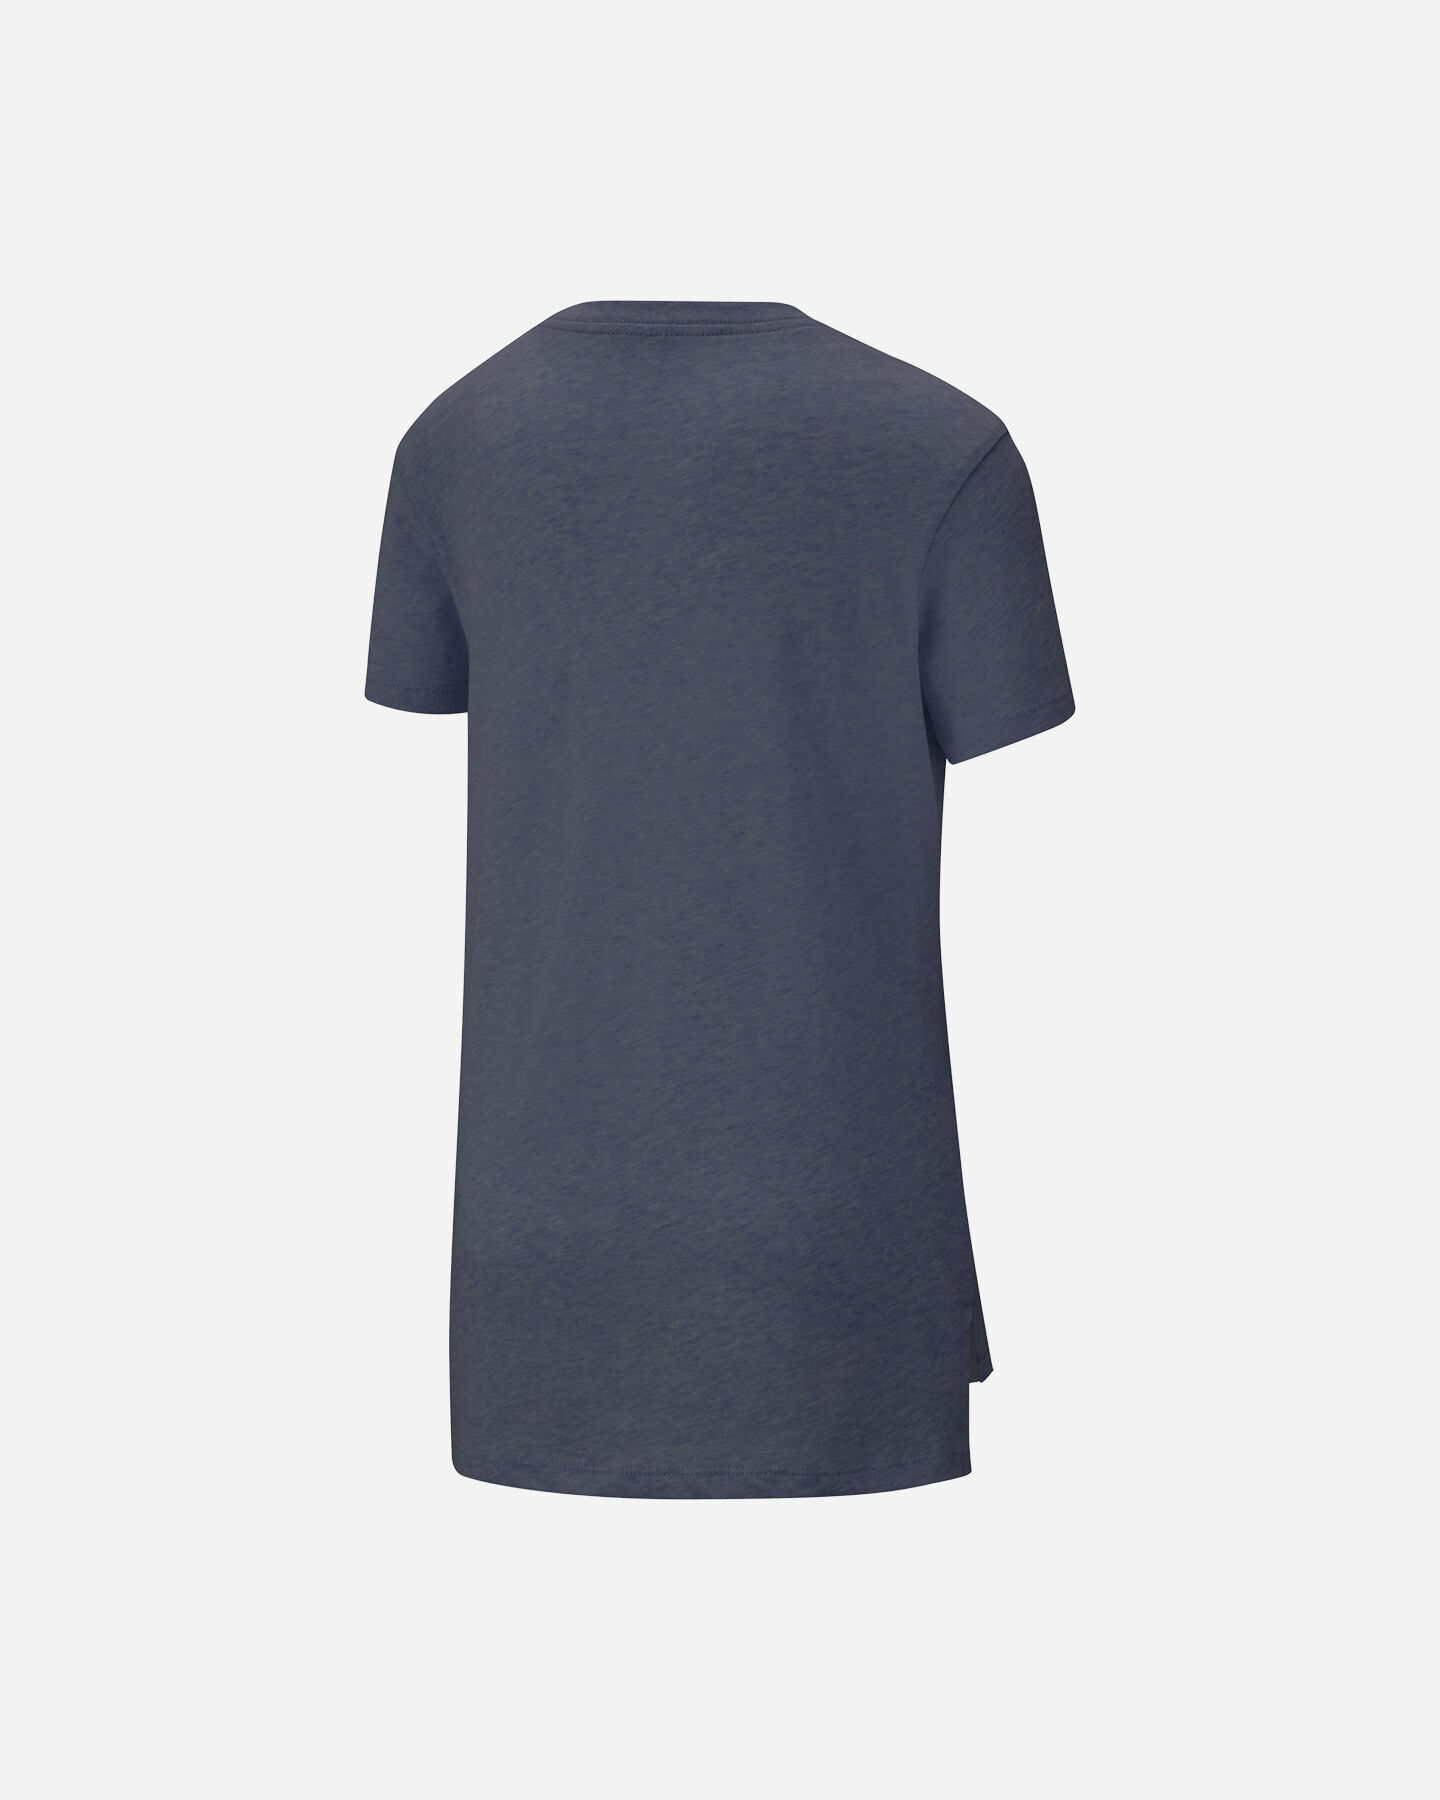 T-Shirt NIKE FUTURA JR S5194934 scatto 1